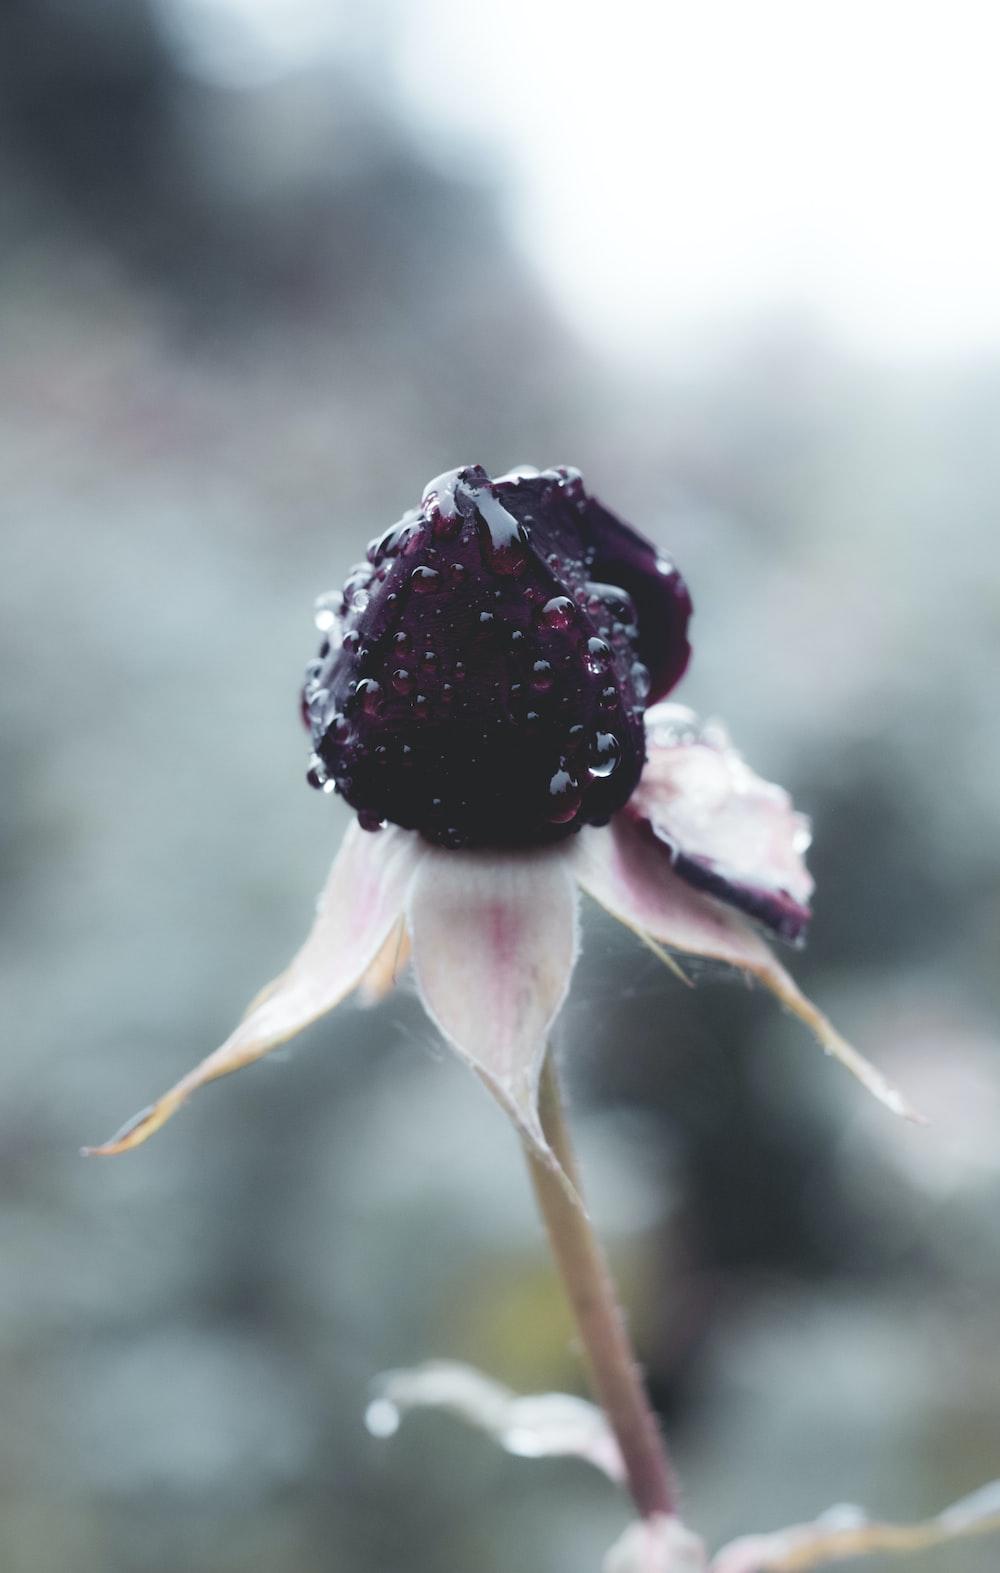 purple petaled flower close-up photo